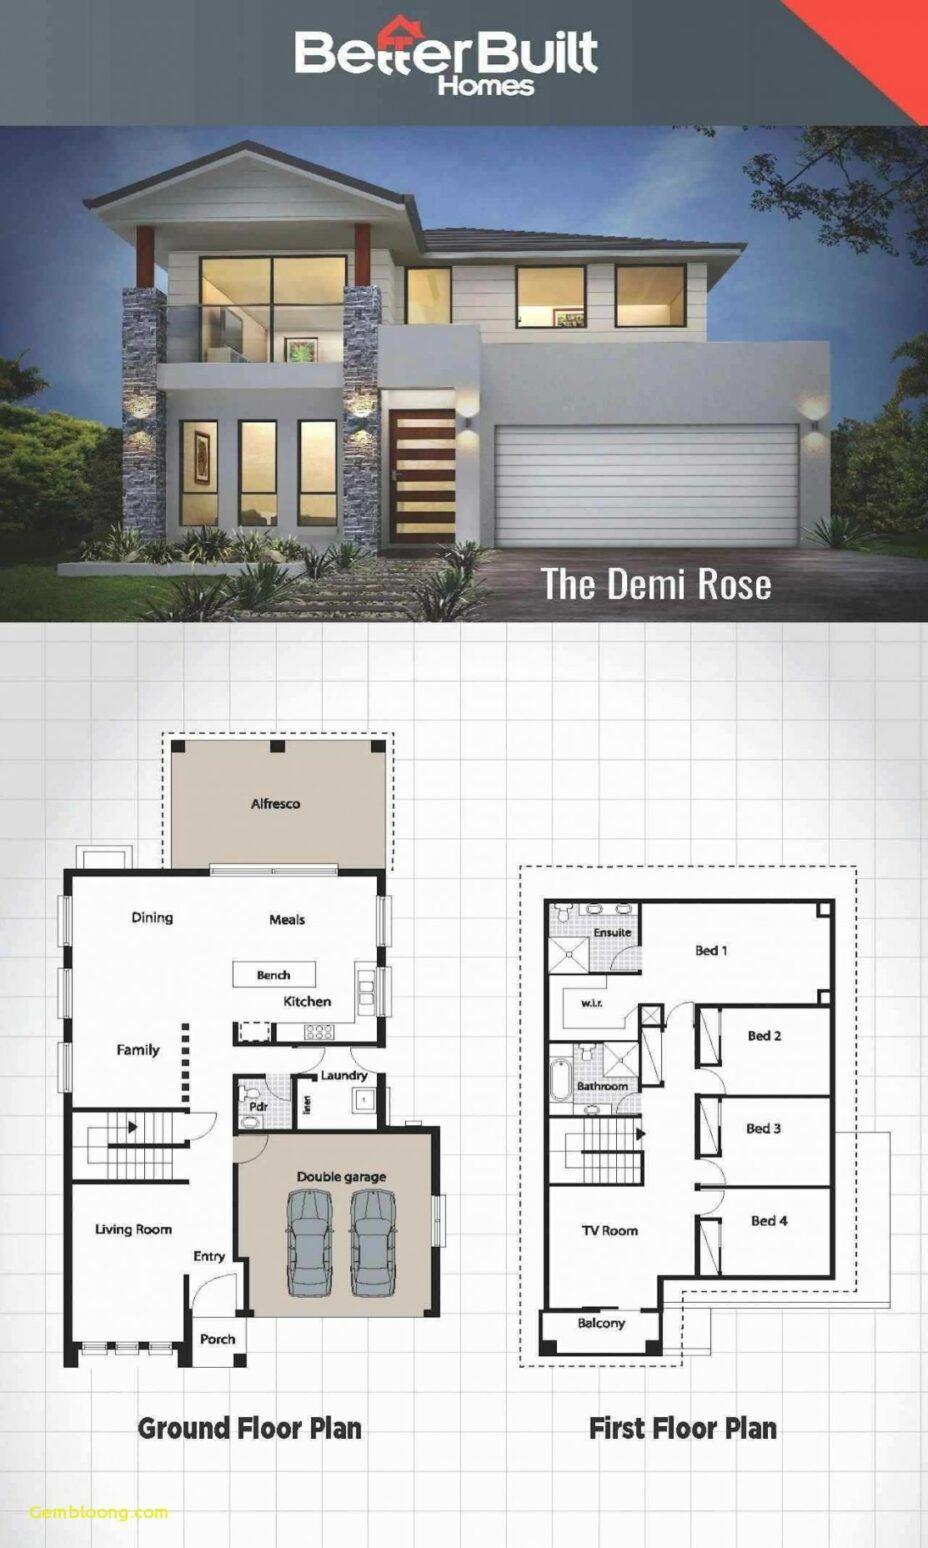 Flat Roof House Plans Design 2021 In 2020 Modern House Floor Plans House Blueprints Double Storey House